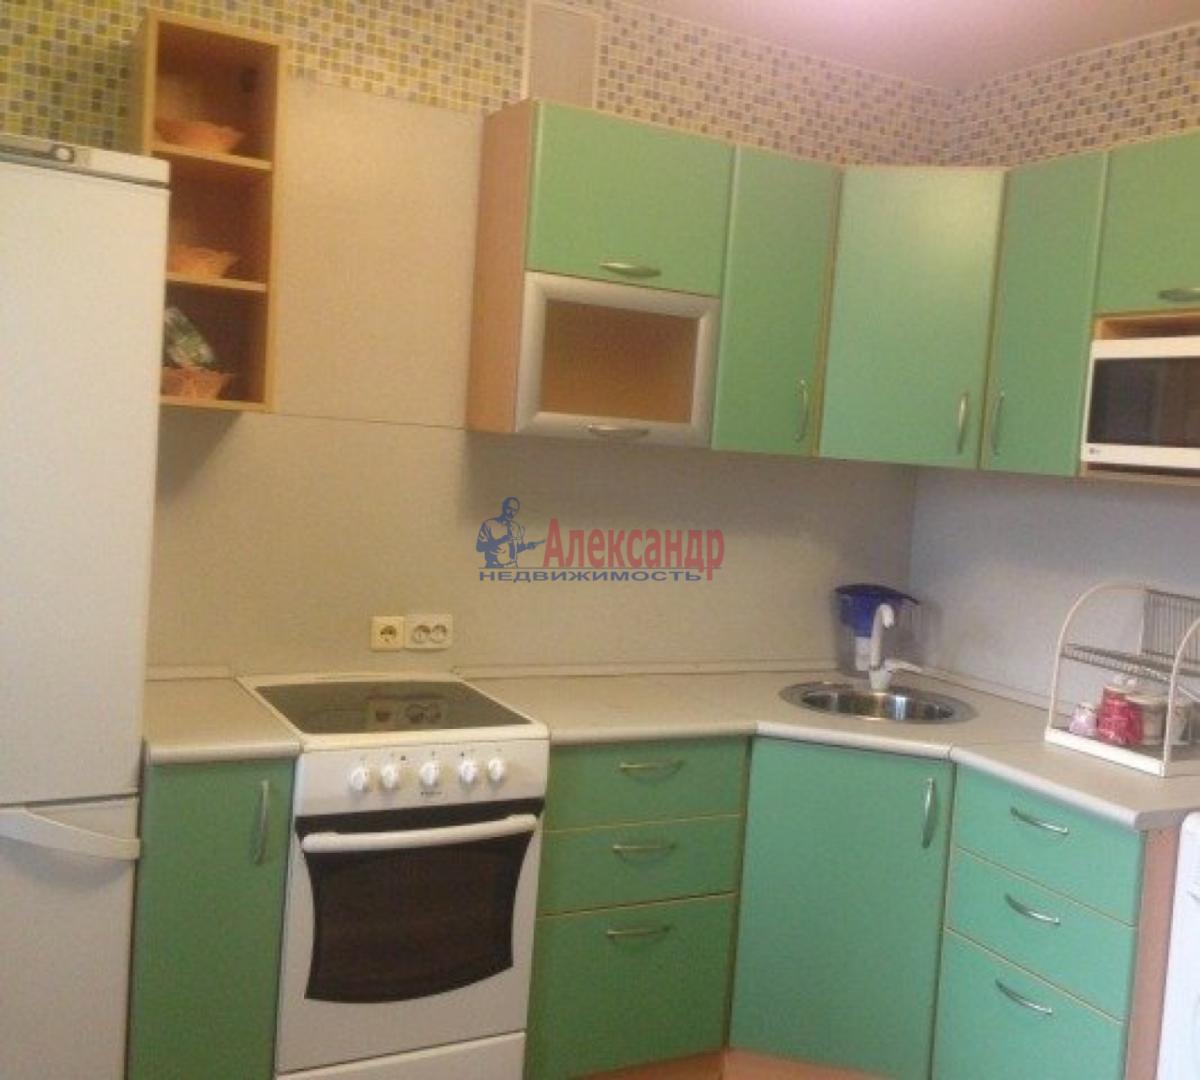 1-комнатная квартира (40м2) в аренду по адресу Маршала Захарова ул., 60— фото 6 из 8